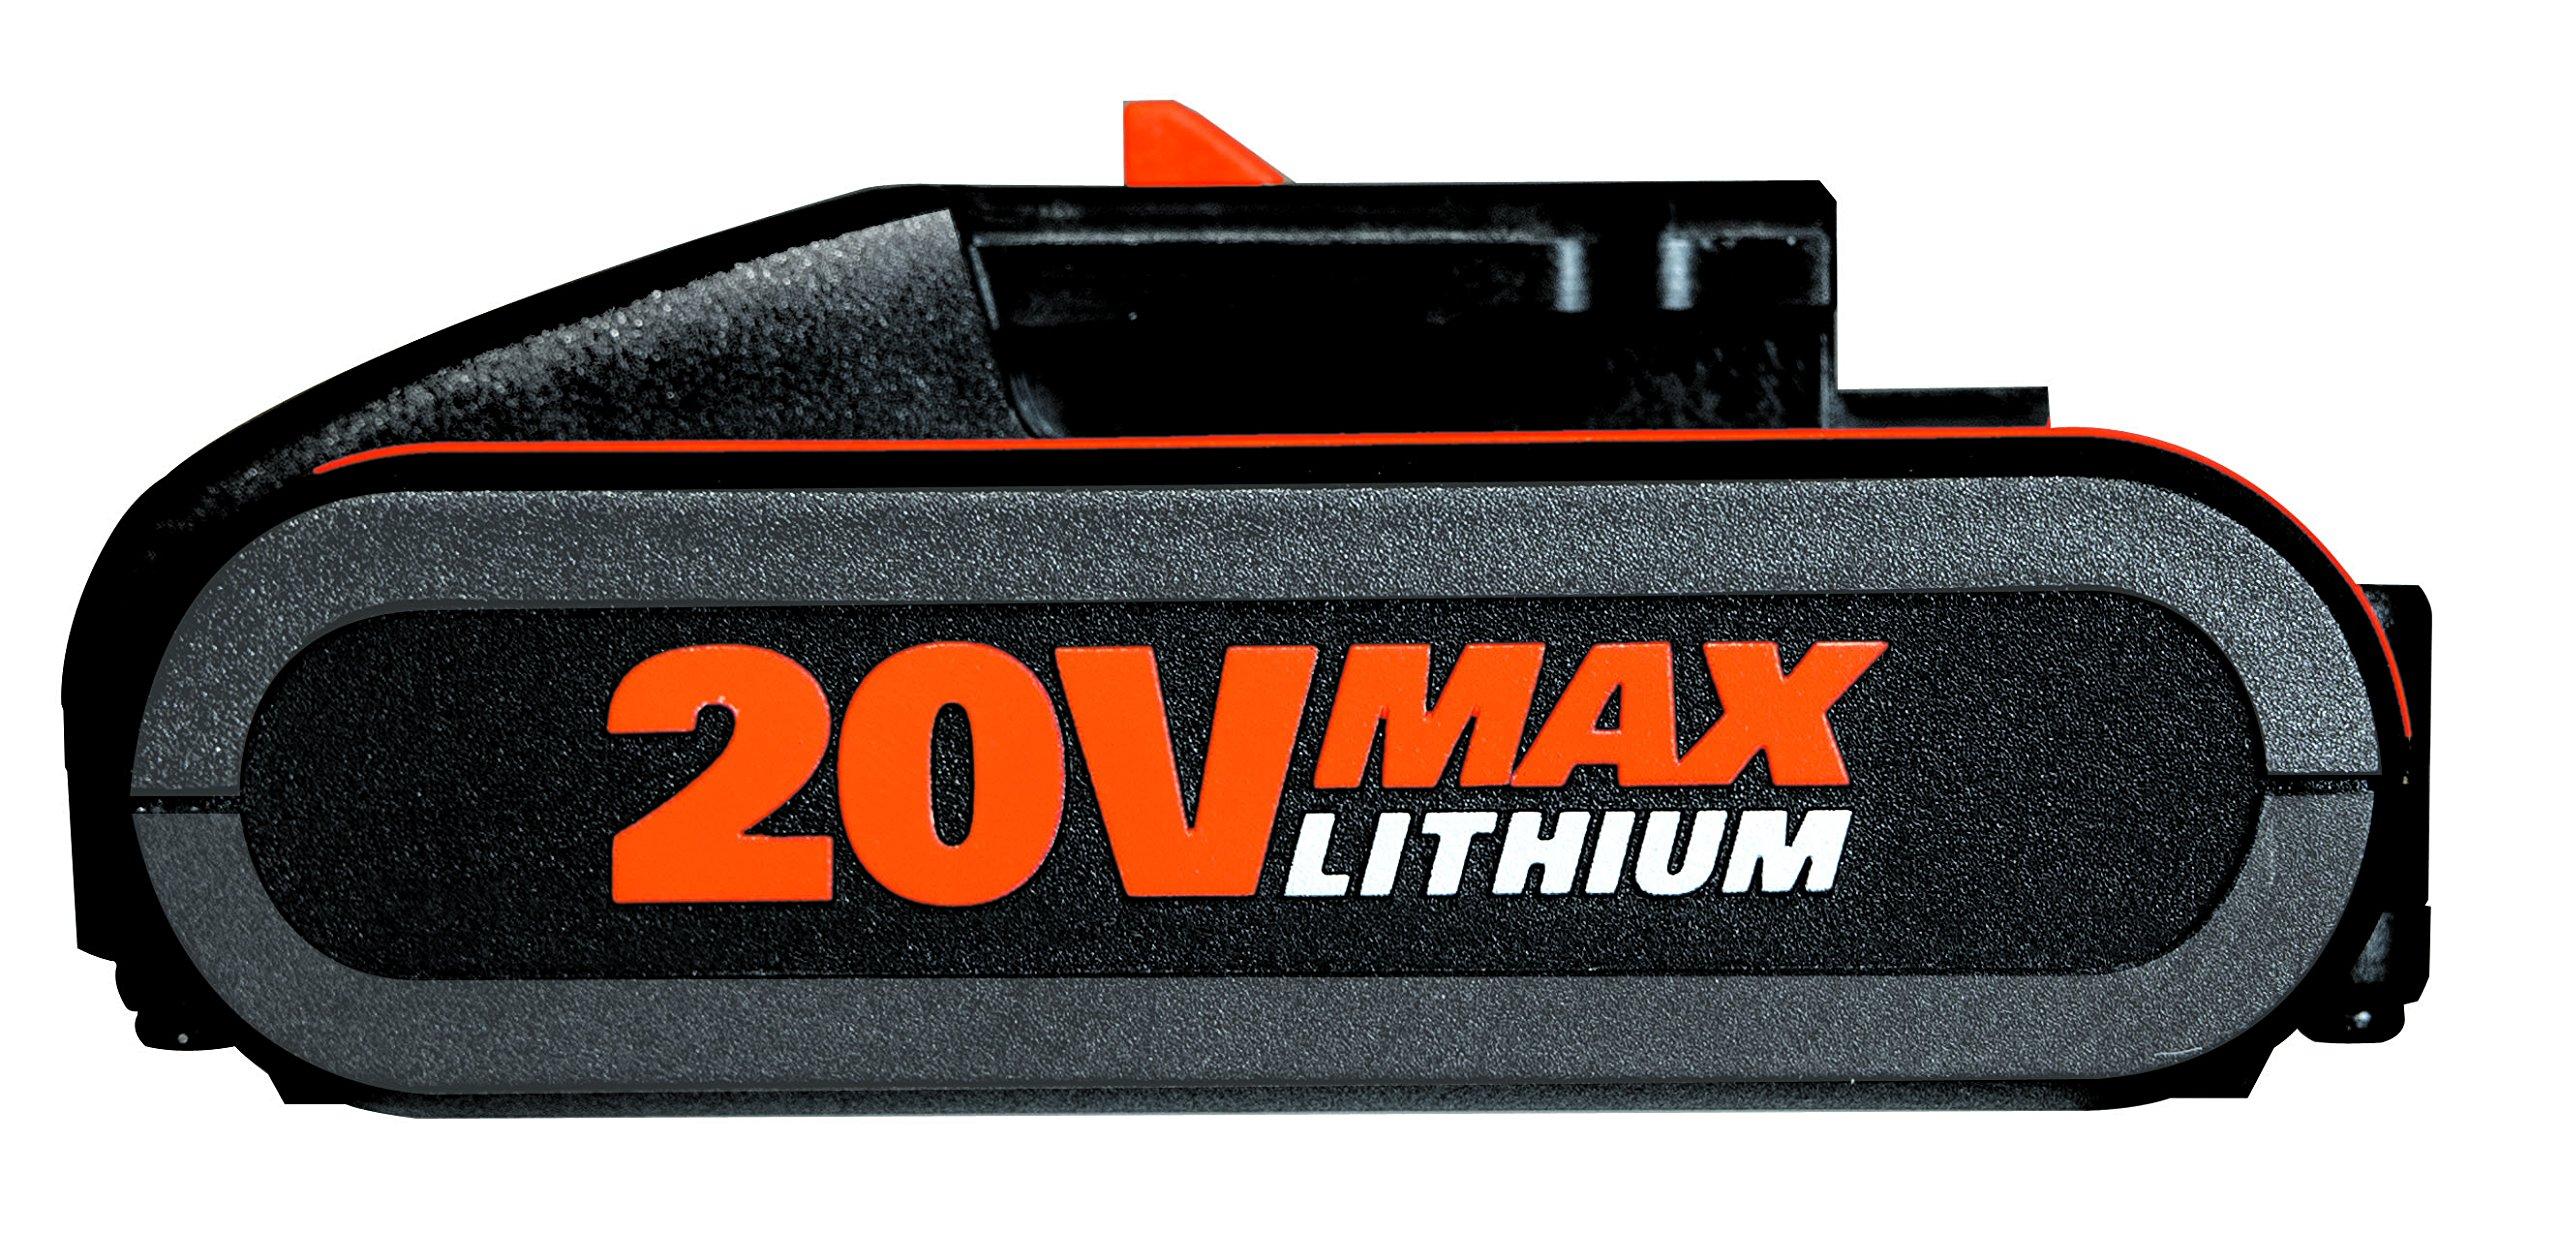 Worx WA3572 Akku 20V, 2,5Ah, für alle Worx Geräte – 2500mAh Li-Ion Akku PowerShare